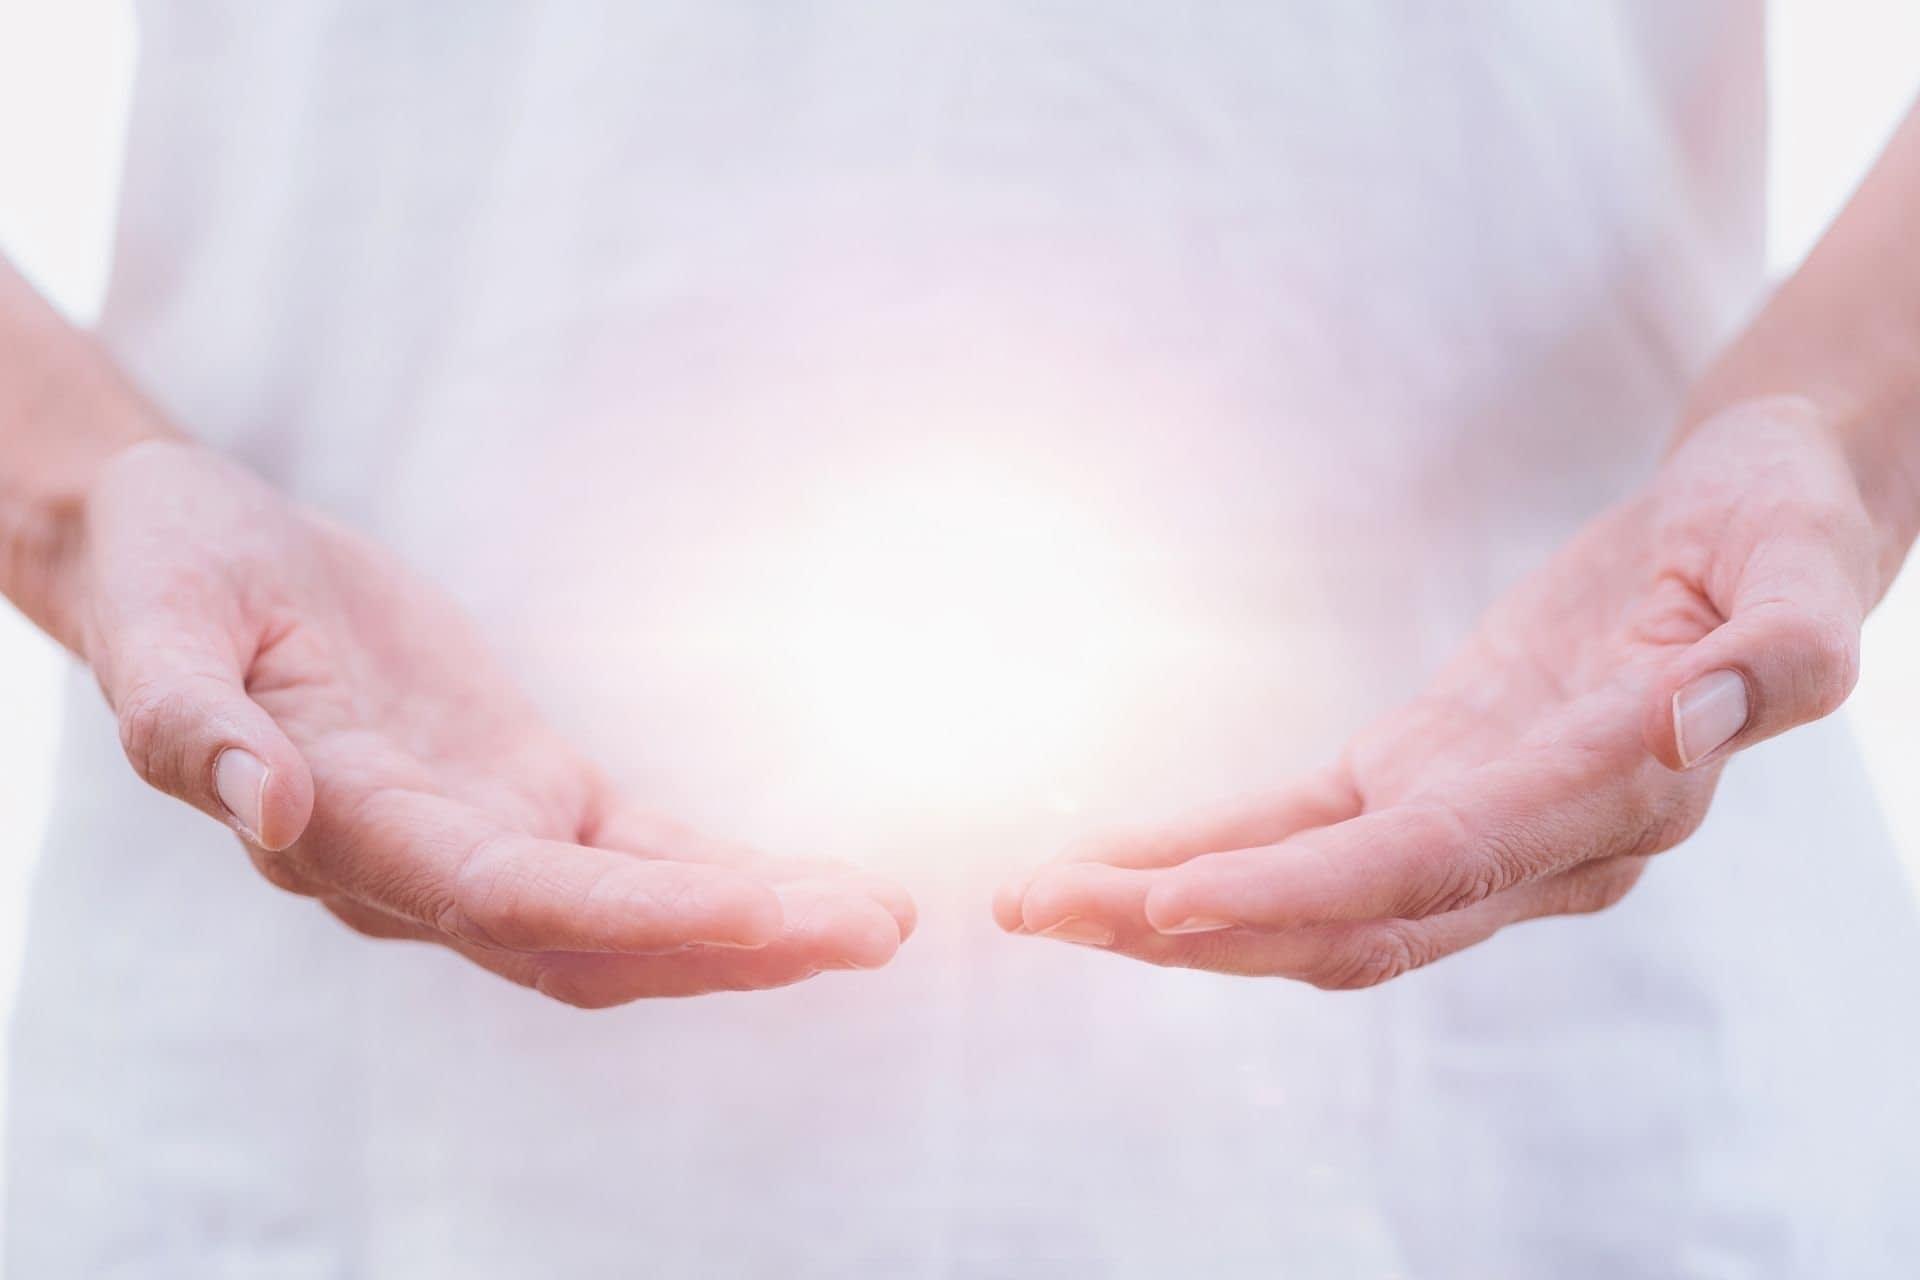 Shake & Release with Yoga Nidra Meditation for Healing